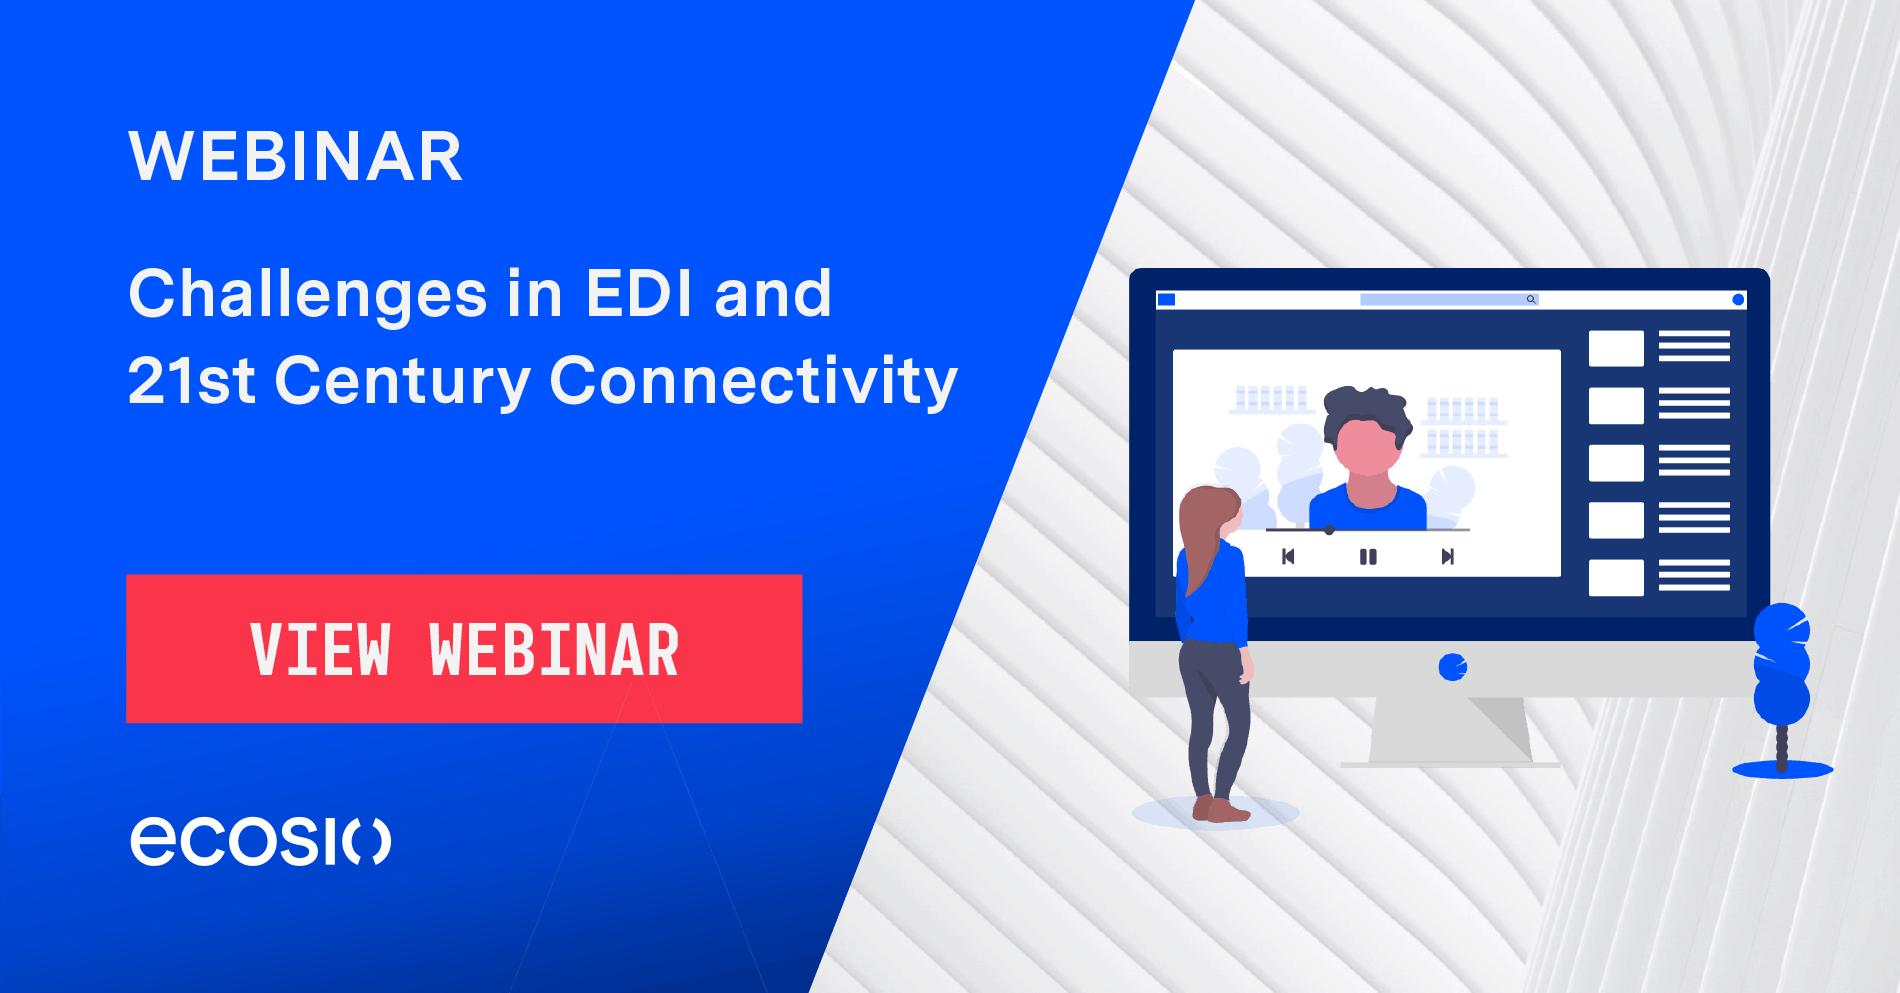 Webinar - Challenges in 21st Century Connectivity